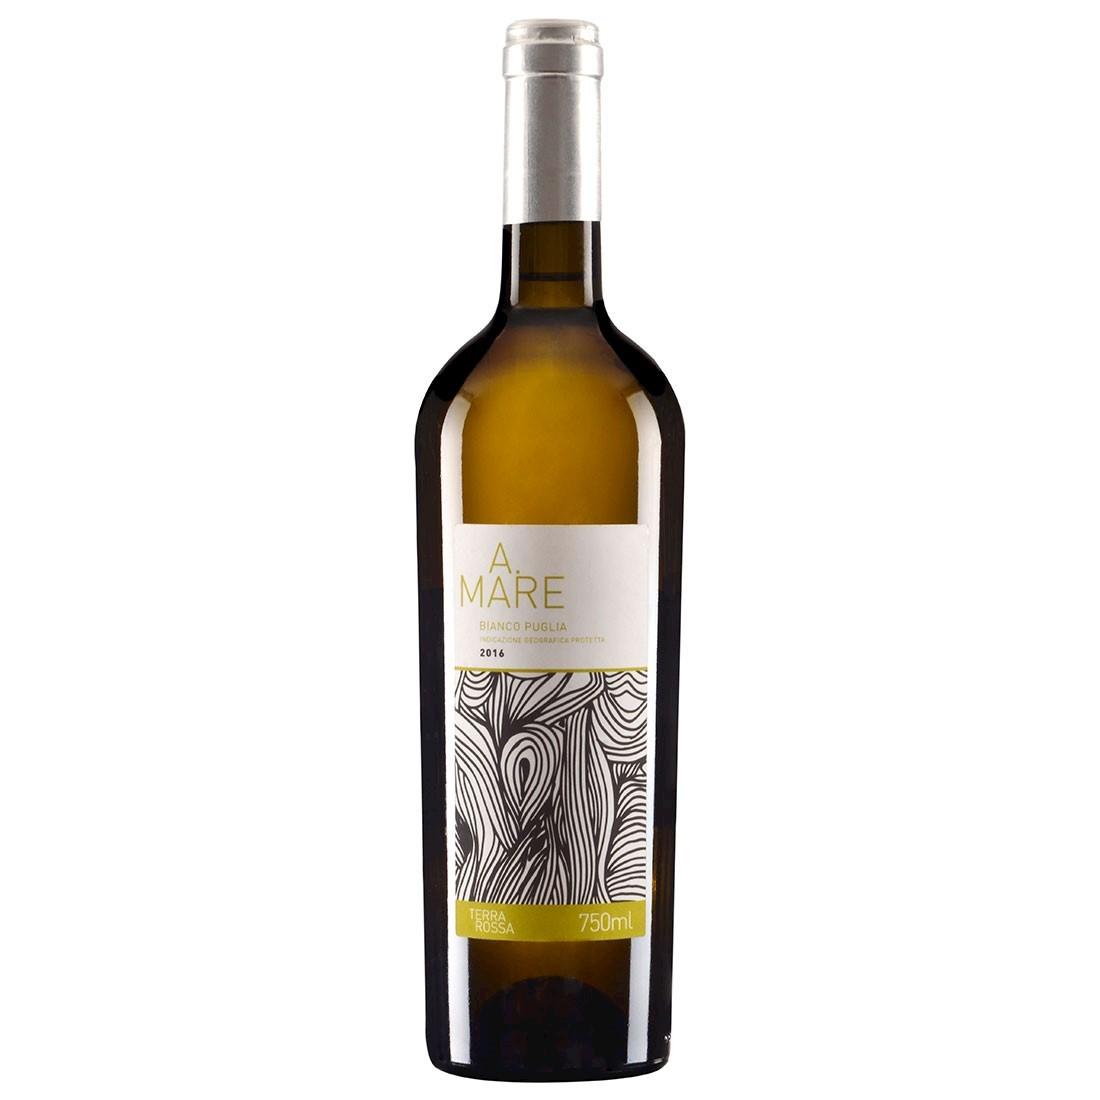 Vinho Italiano Dai Terra Rossa A.Mare Bianco Puglia IGP 2020 (750ml)